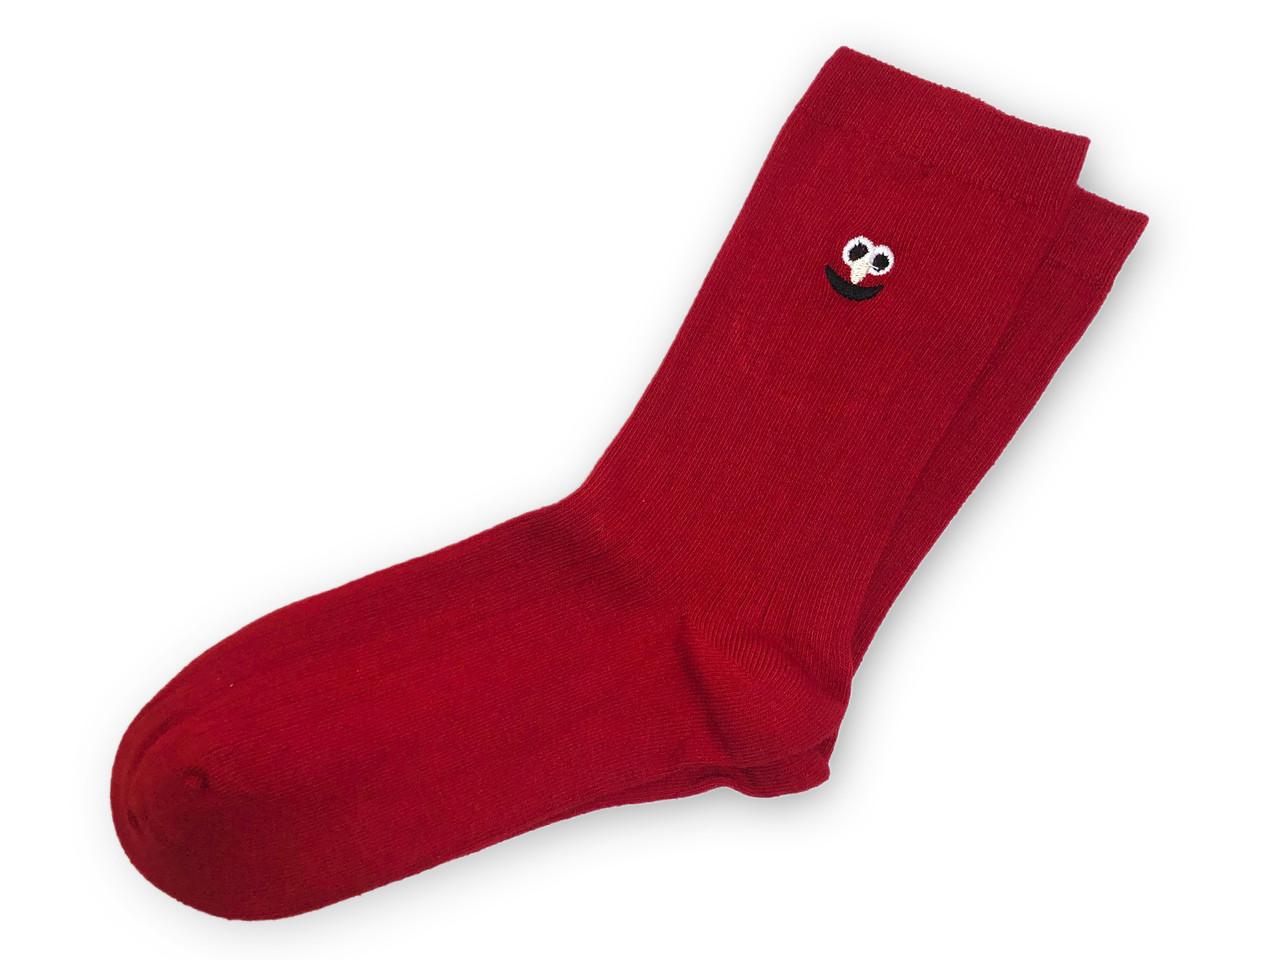 Носки Neseli Daily Premium Смайлы красные 7144